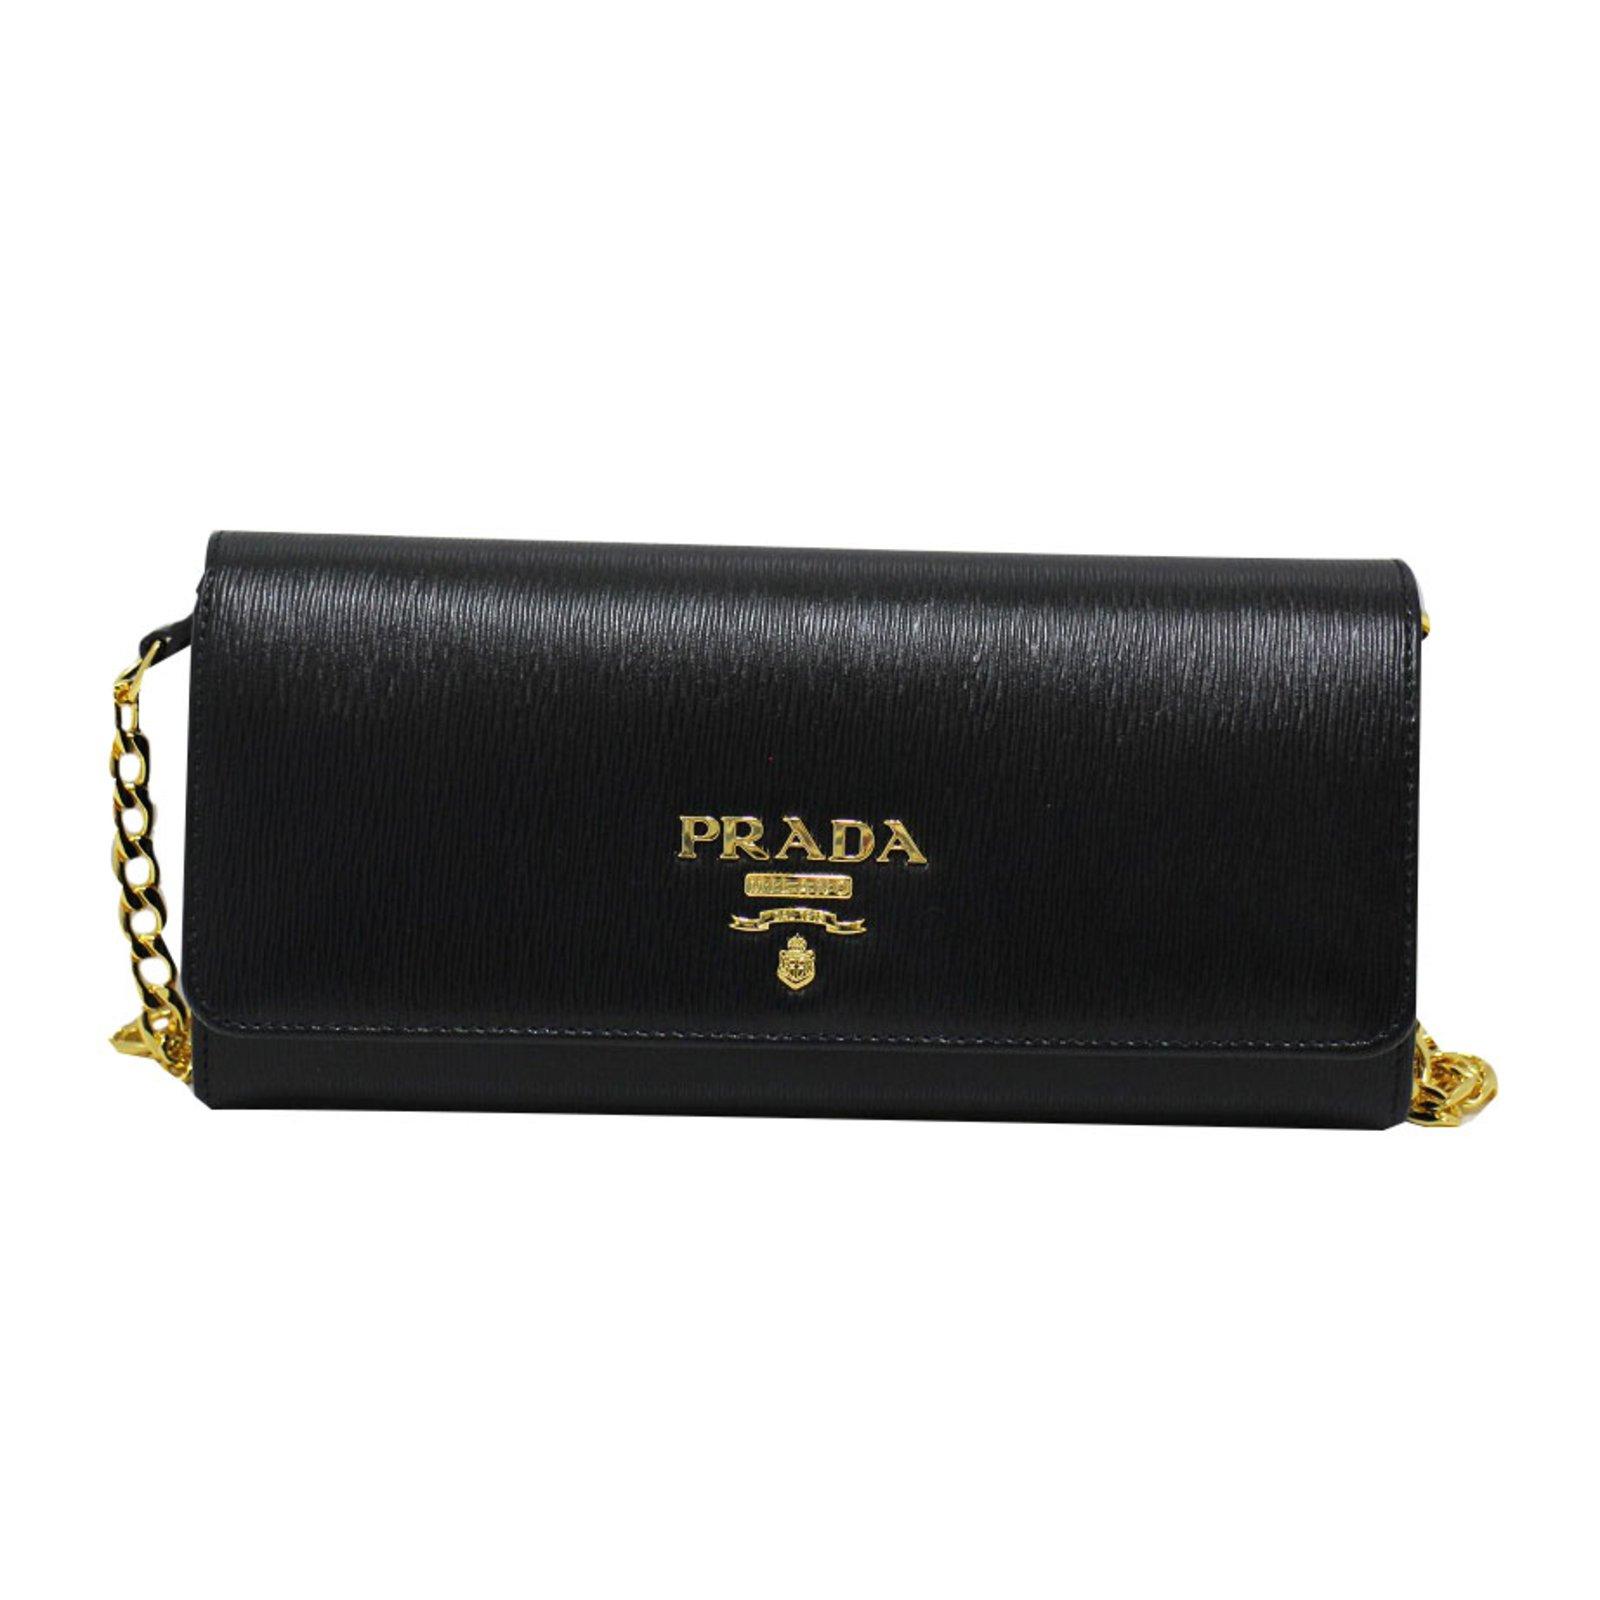 b39223af62 ... discount code for prada prada black leather cross body bag purses  wallets cases leather black ref